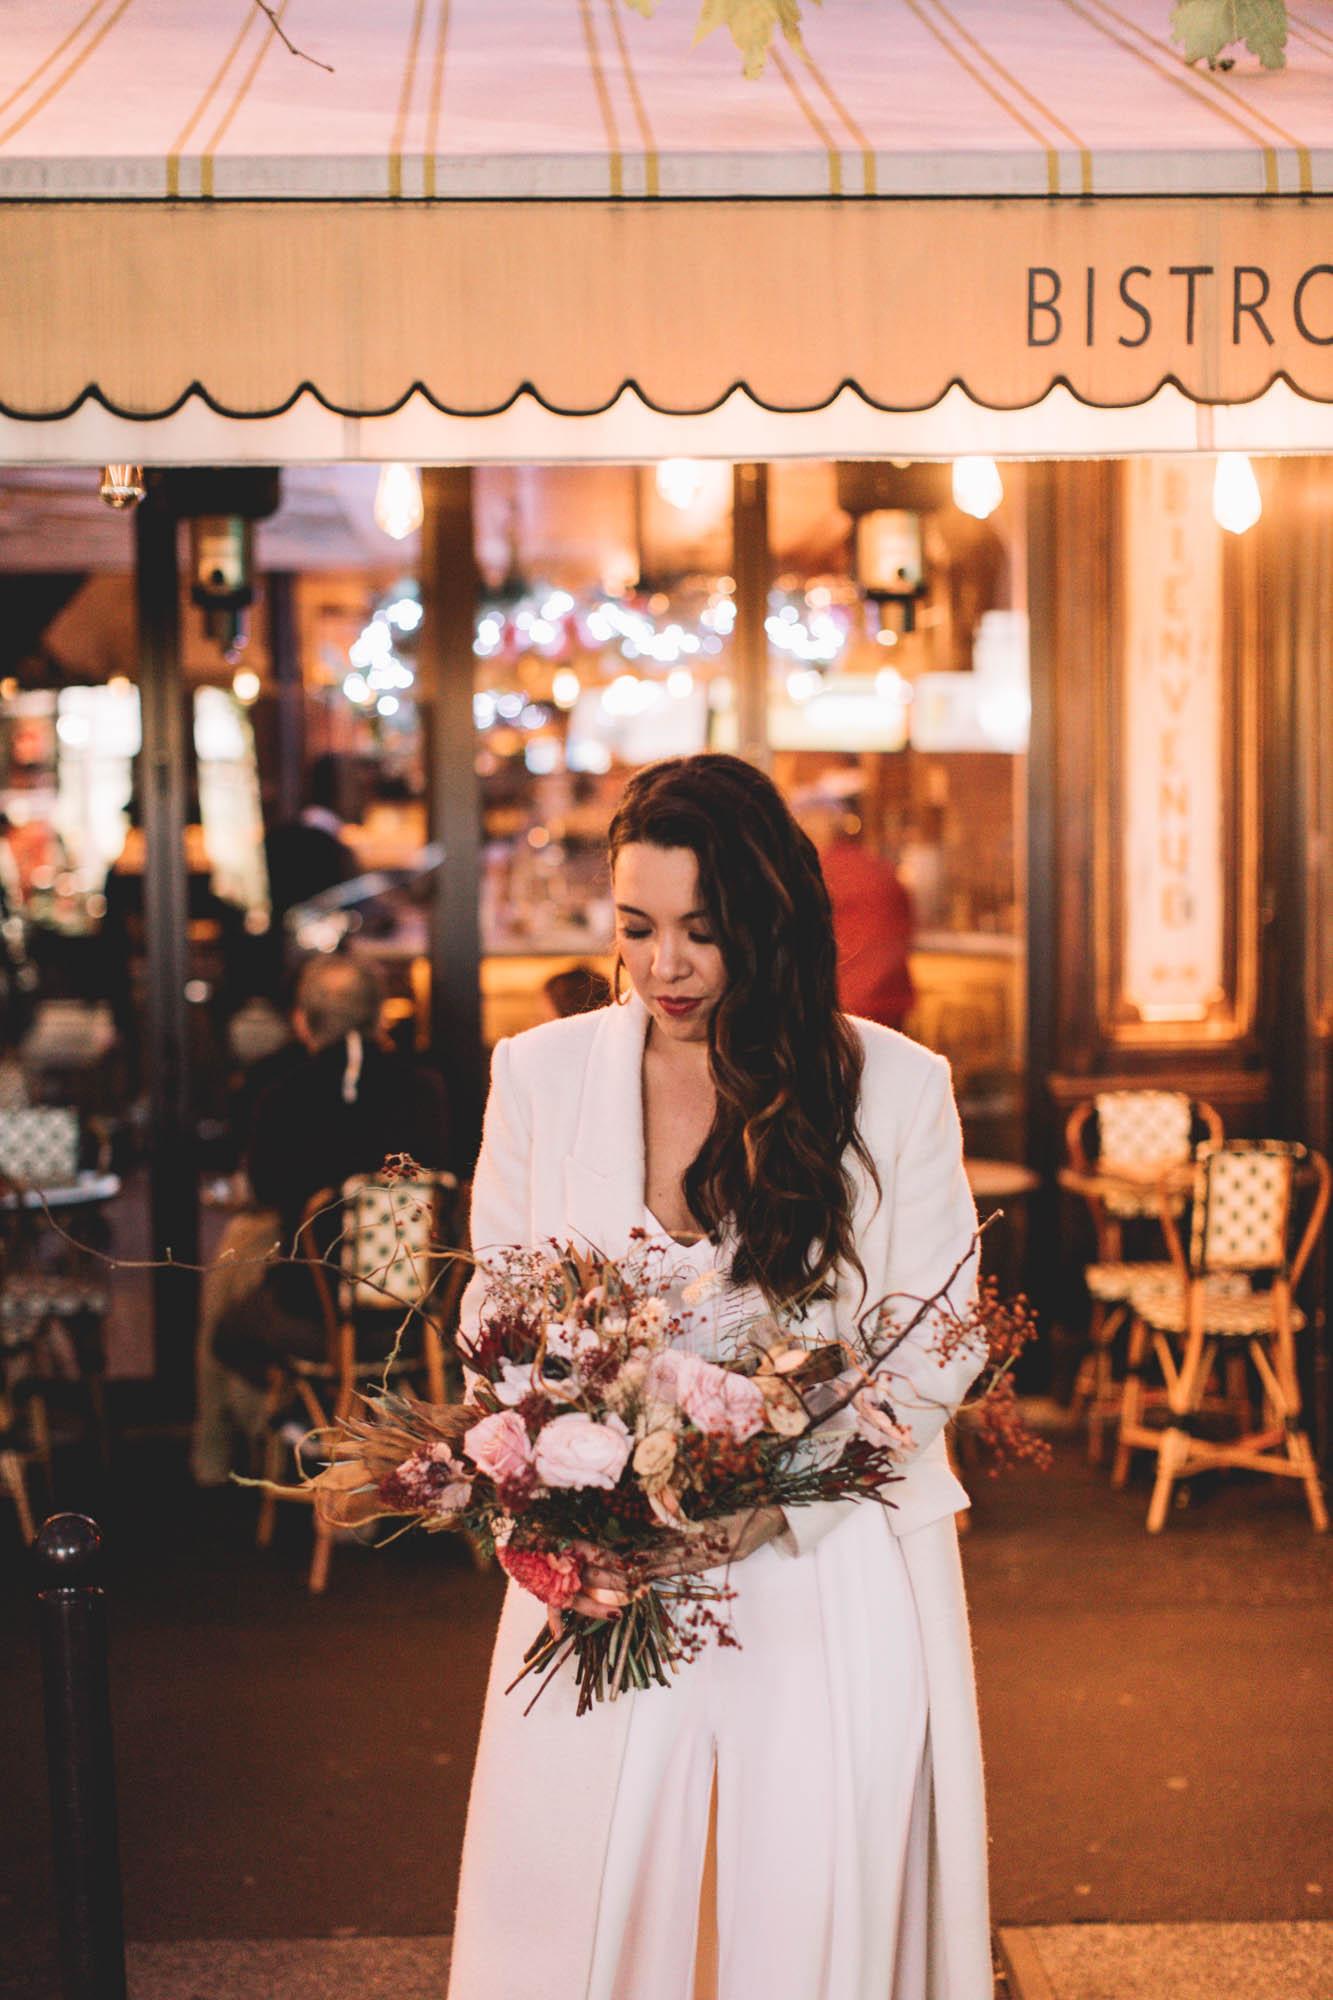 MIMI + JON_PIGALLE HOTEL_PARIS_PHOTOGRAPHE_MARIAGE_LES BANDITS-5